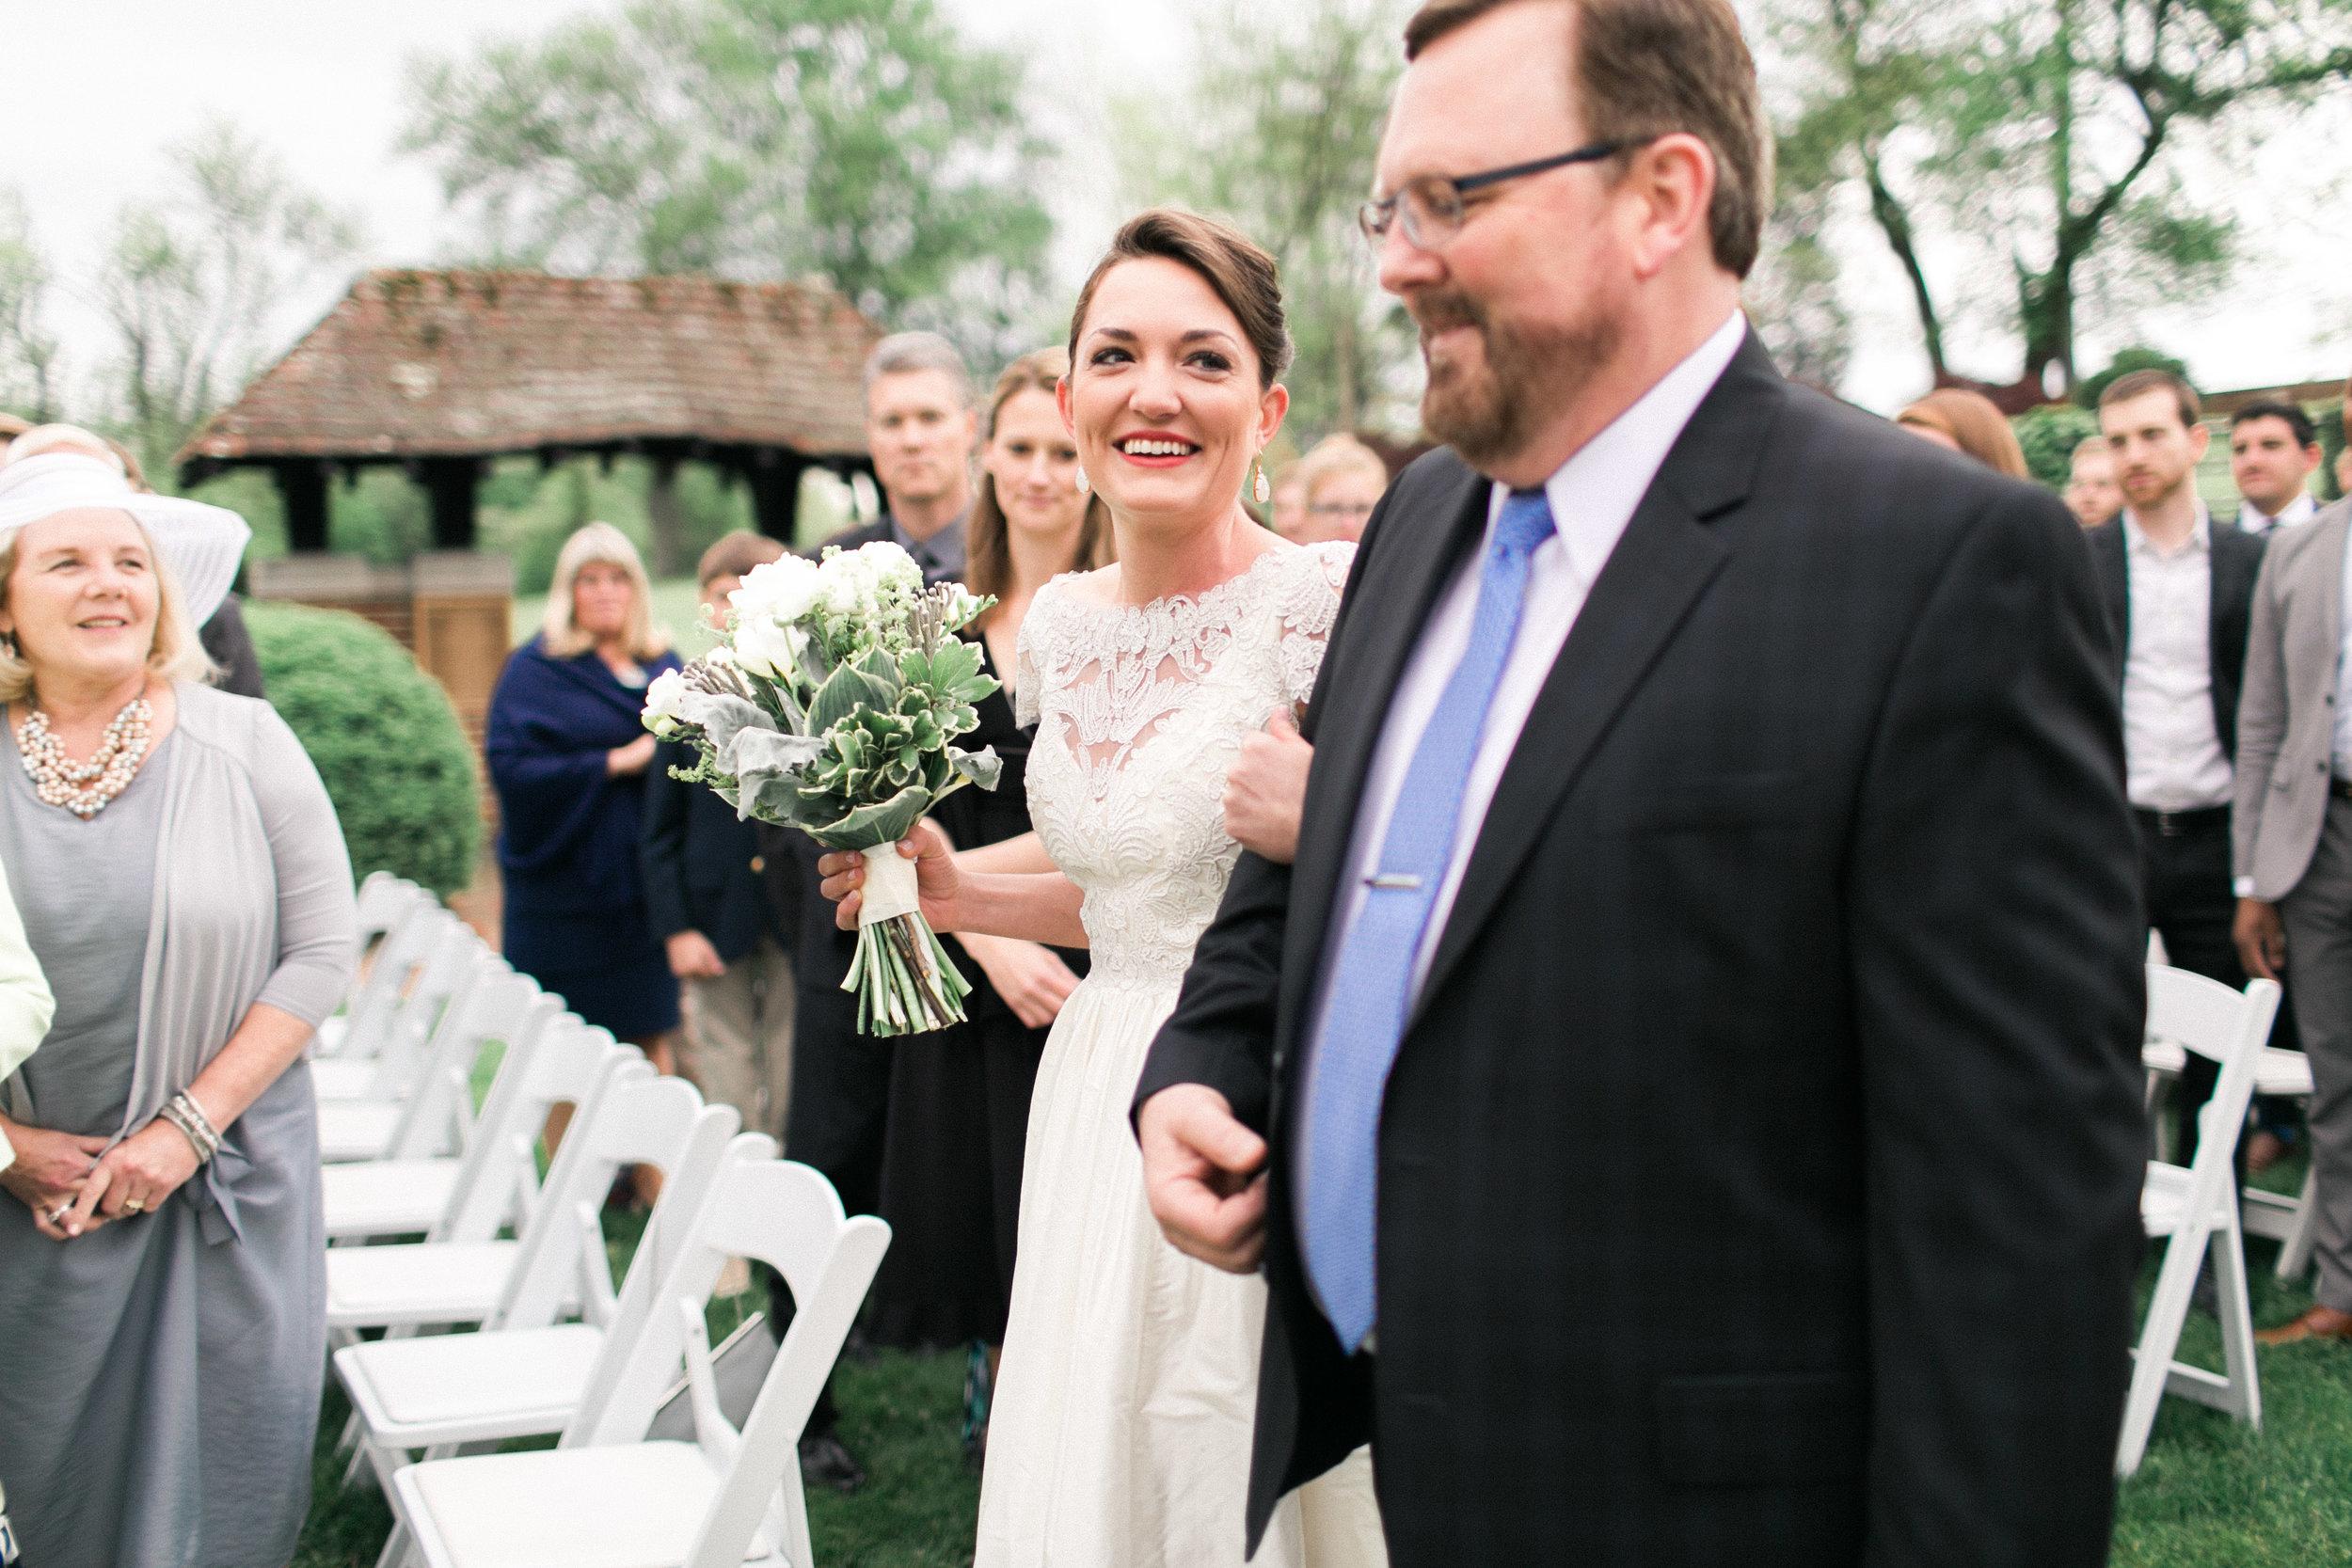 mayden photography weddings-70.jpg